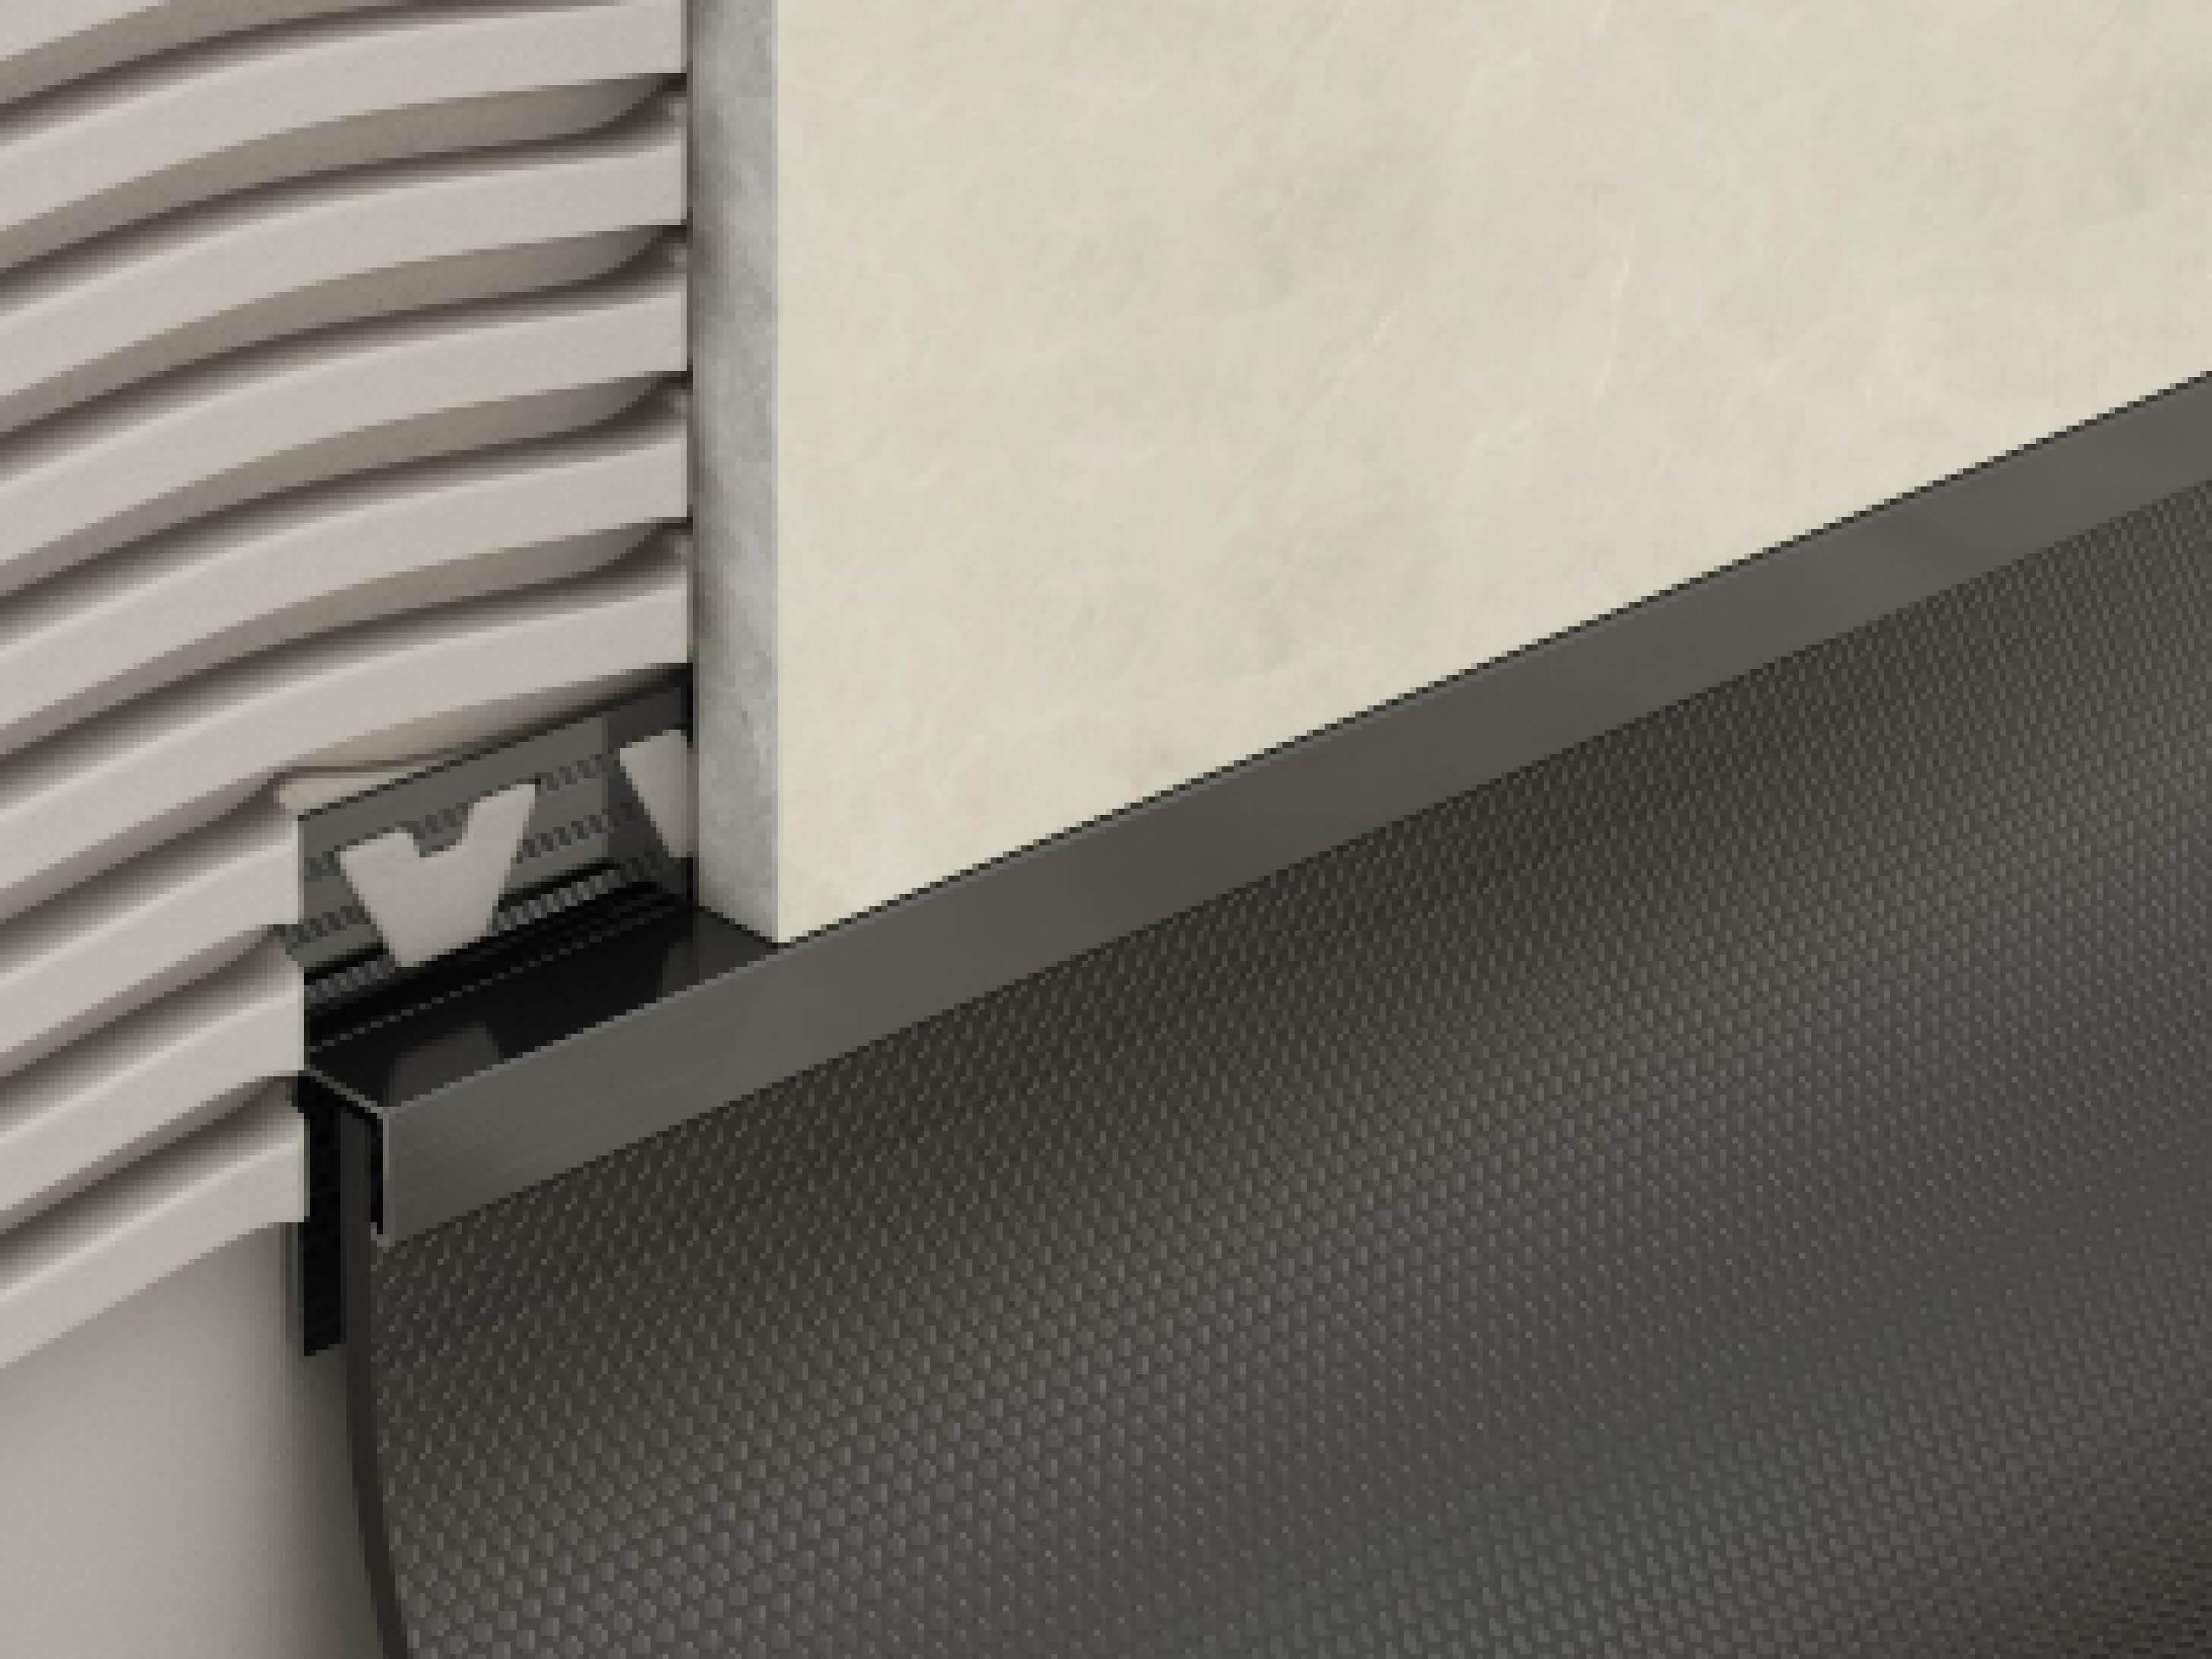 Atrim PVC Skirting Trim 2.5m